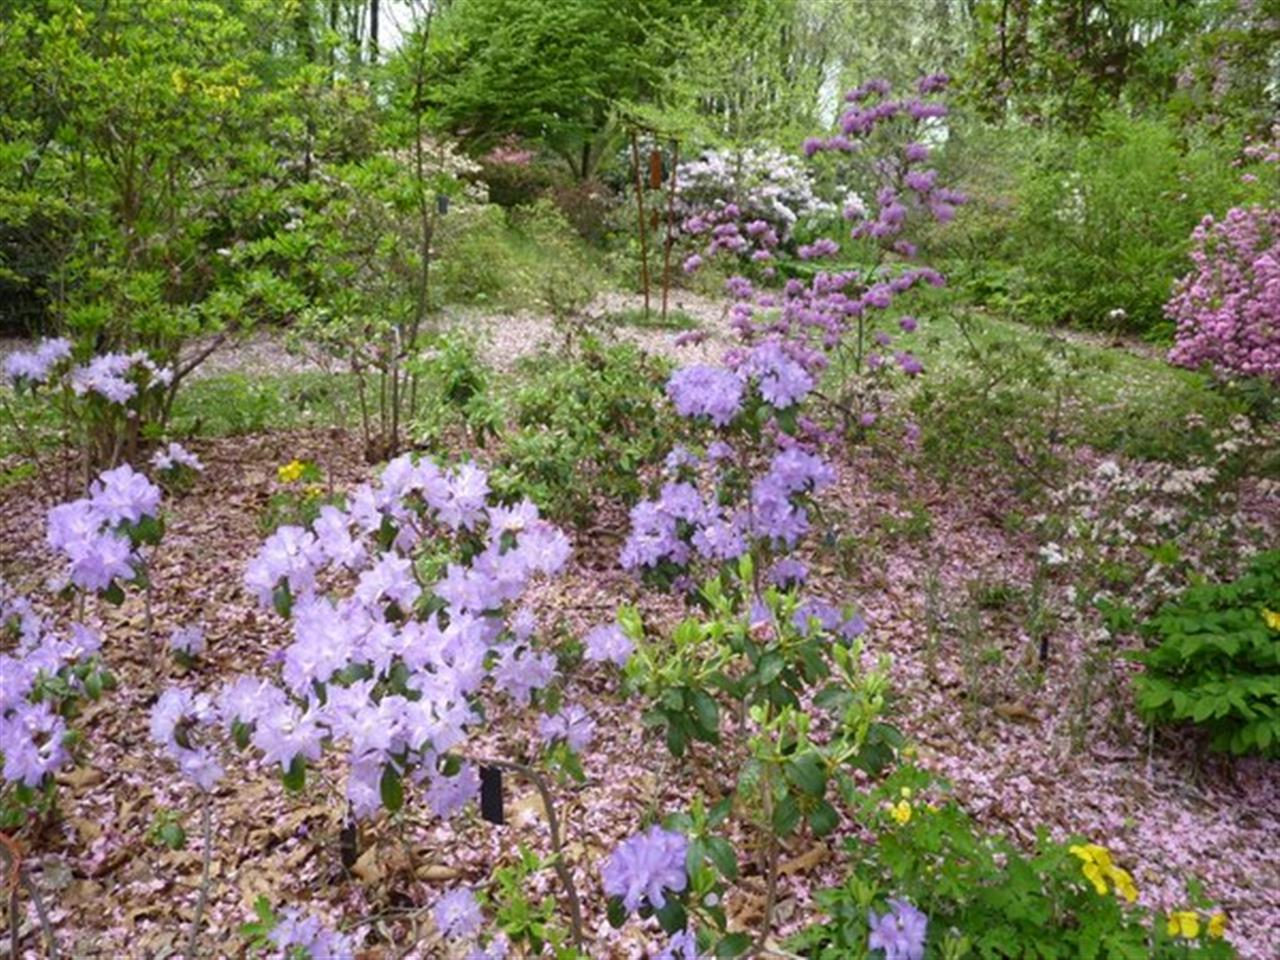 #LeadingRELocal Jenkins Arboretum, Devon PA a great place to enjoy nature